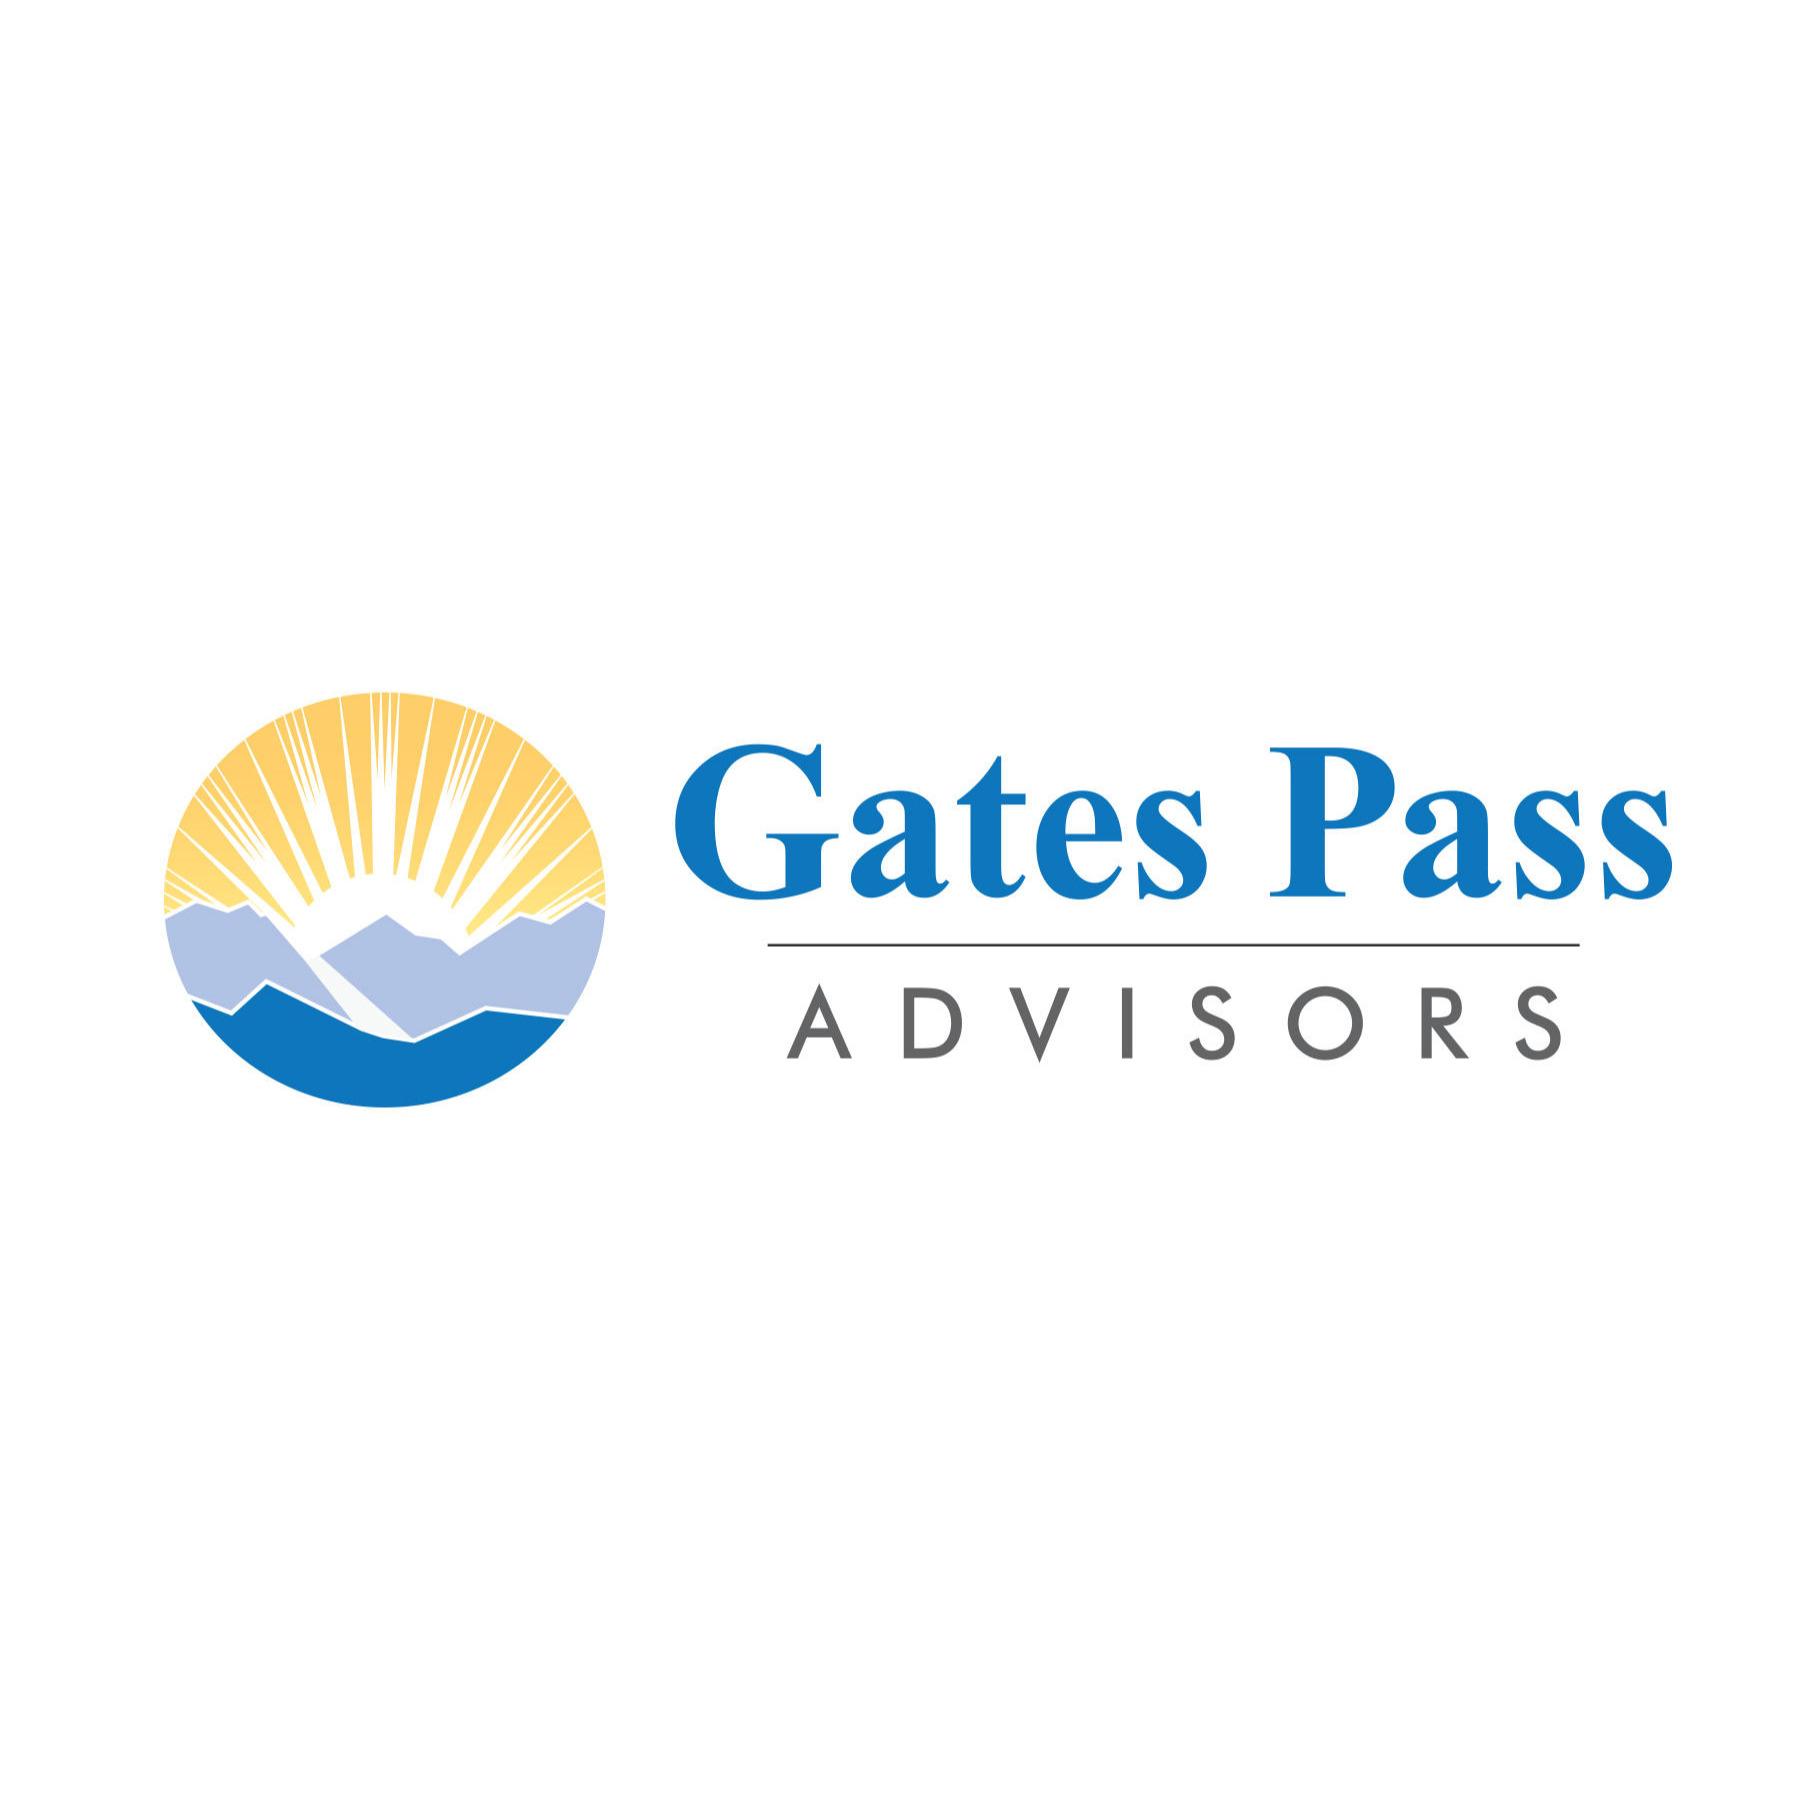 Gates Pass Advisors